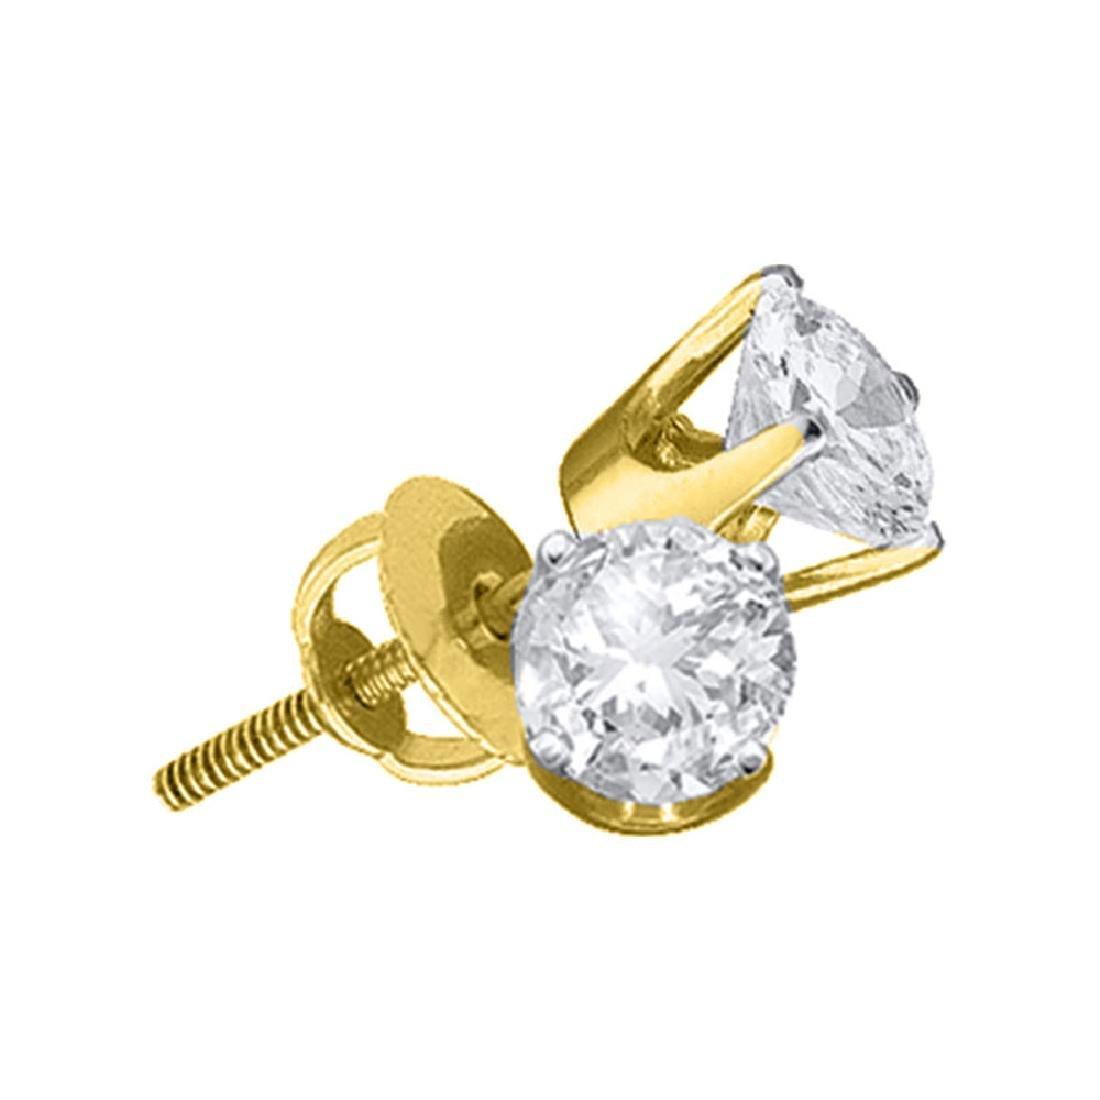 0.24 CTW Diamond Solitaire Stud Earrings 14KT Yellow